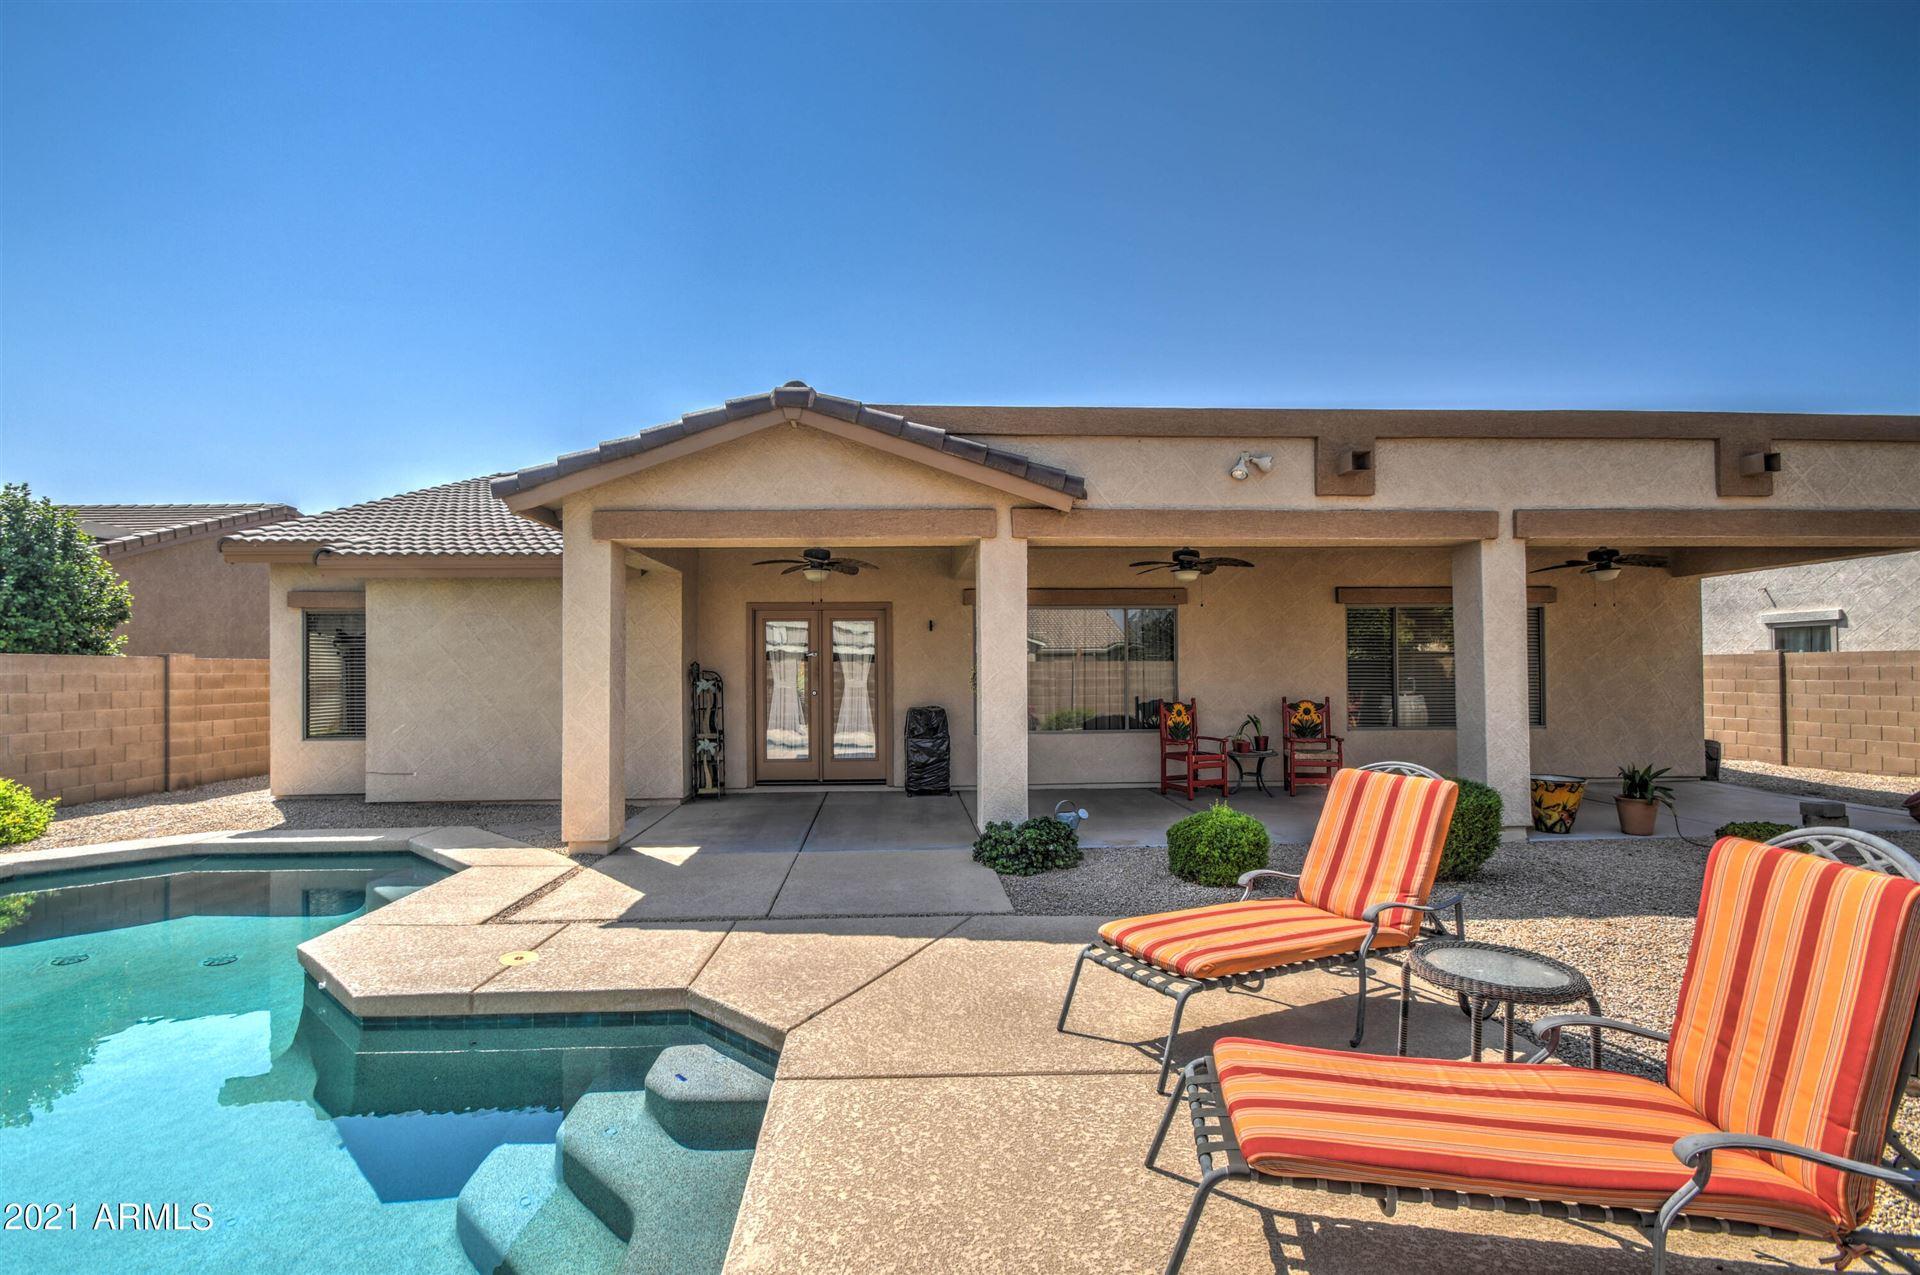 Photo of 21126 E STIRRUP Street, Queen Creek, AZ 85142 (MLS # 6294287)